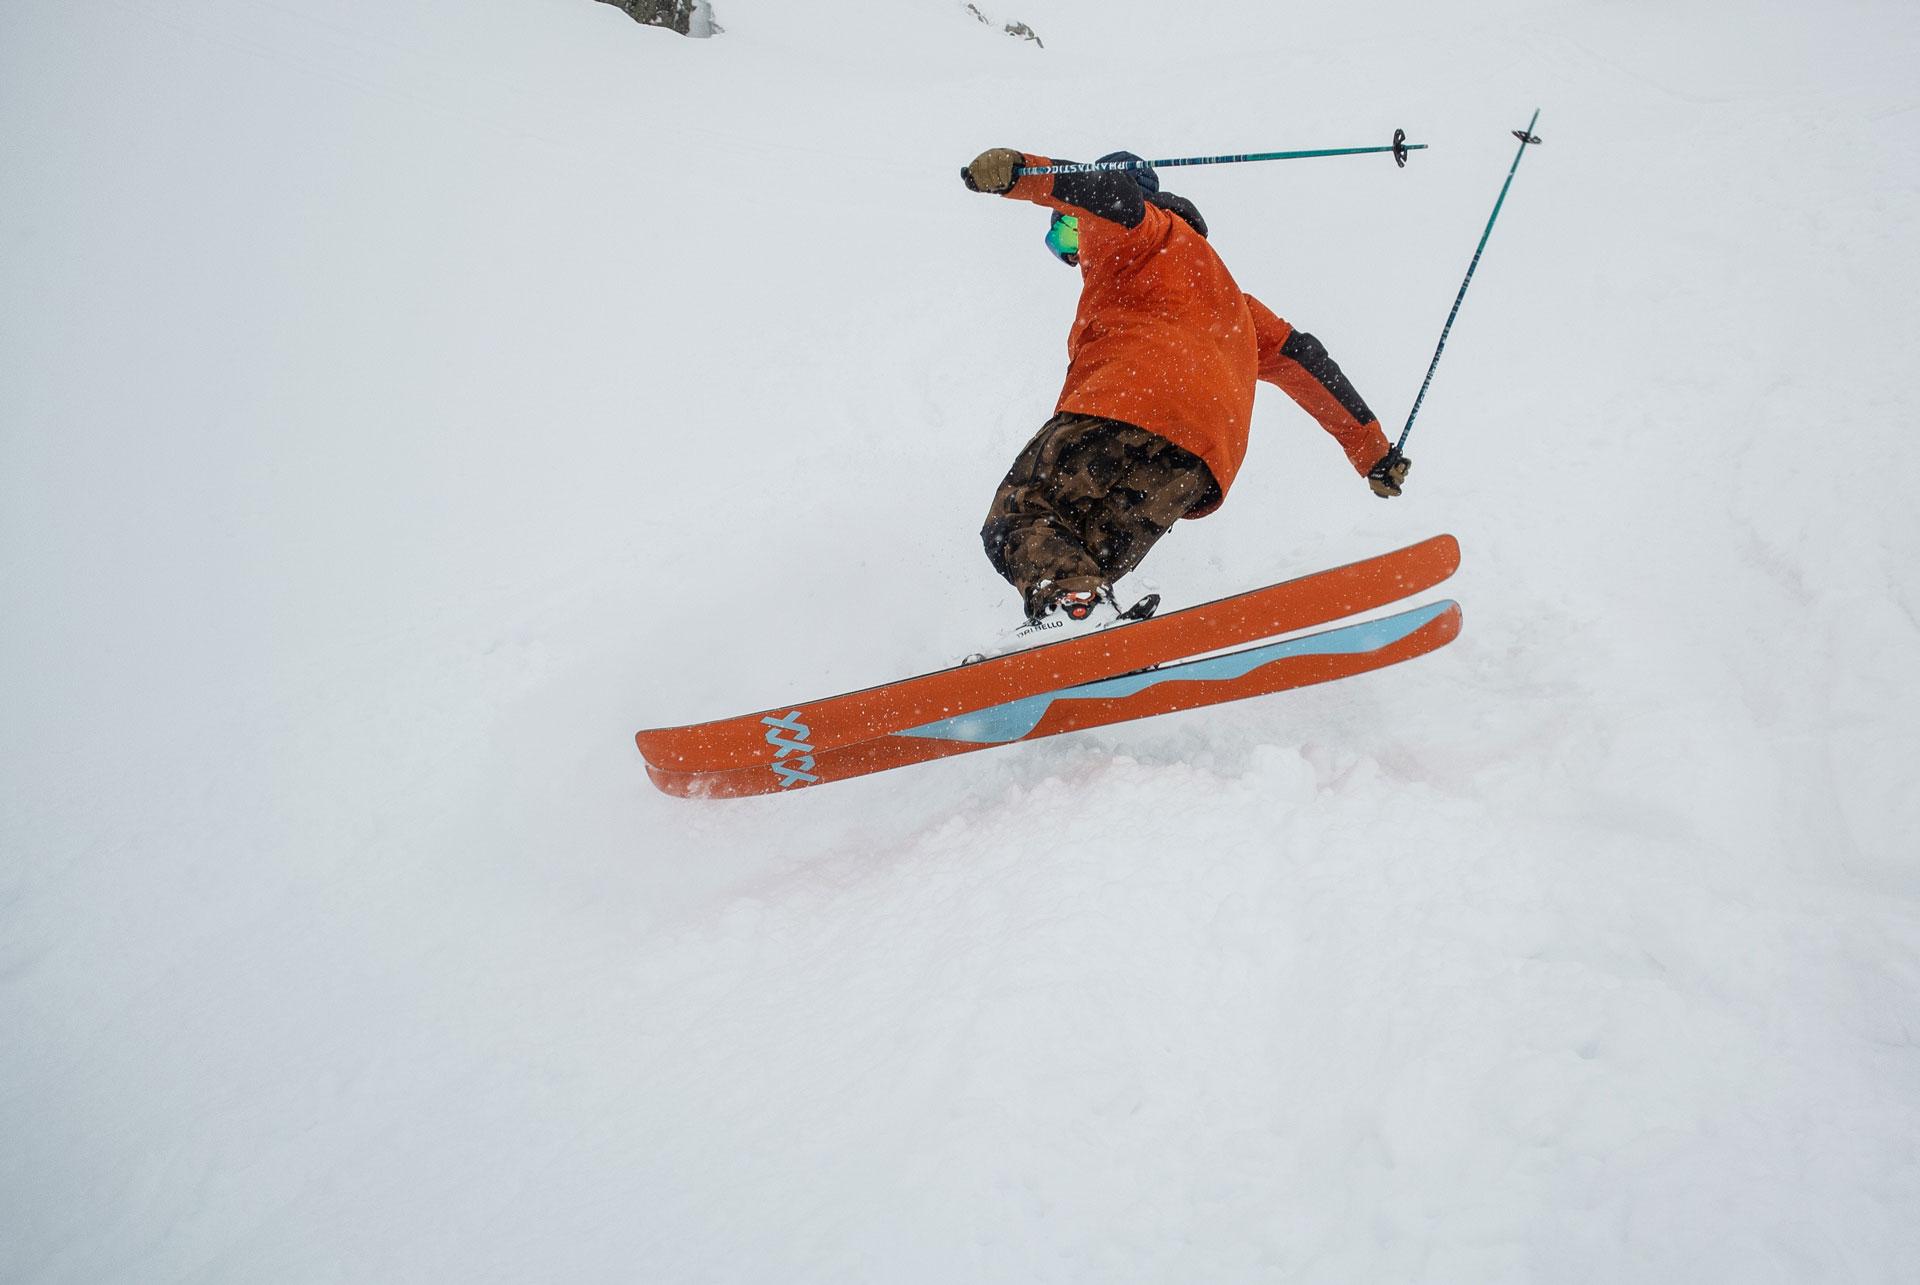 best-powder-skis-jordan-tiernan